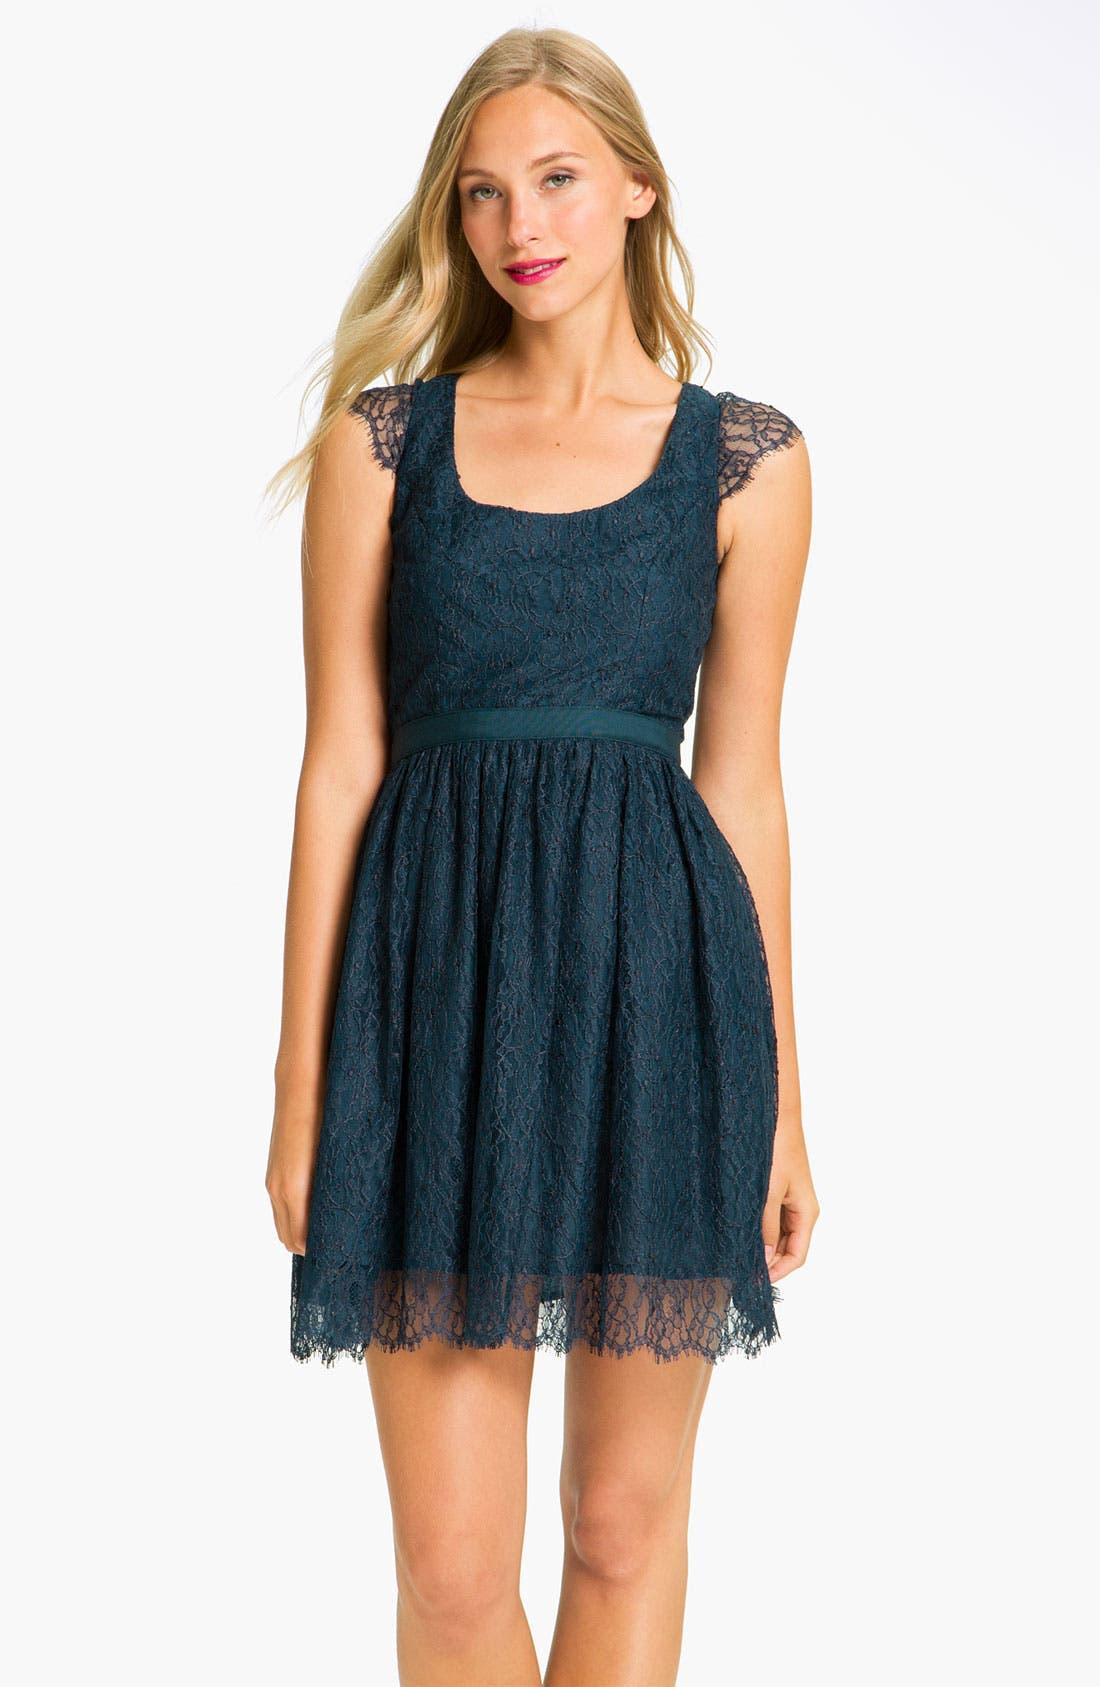 Main Image - Shoshanna 'Risa' Cap Sleeve Chantilly Lace Dress